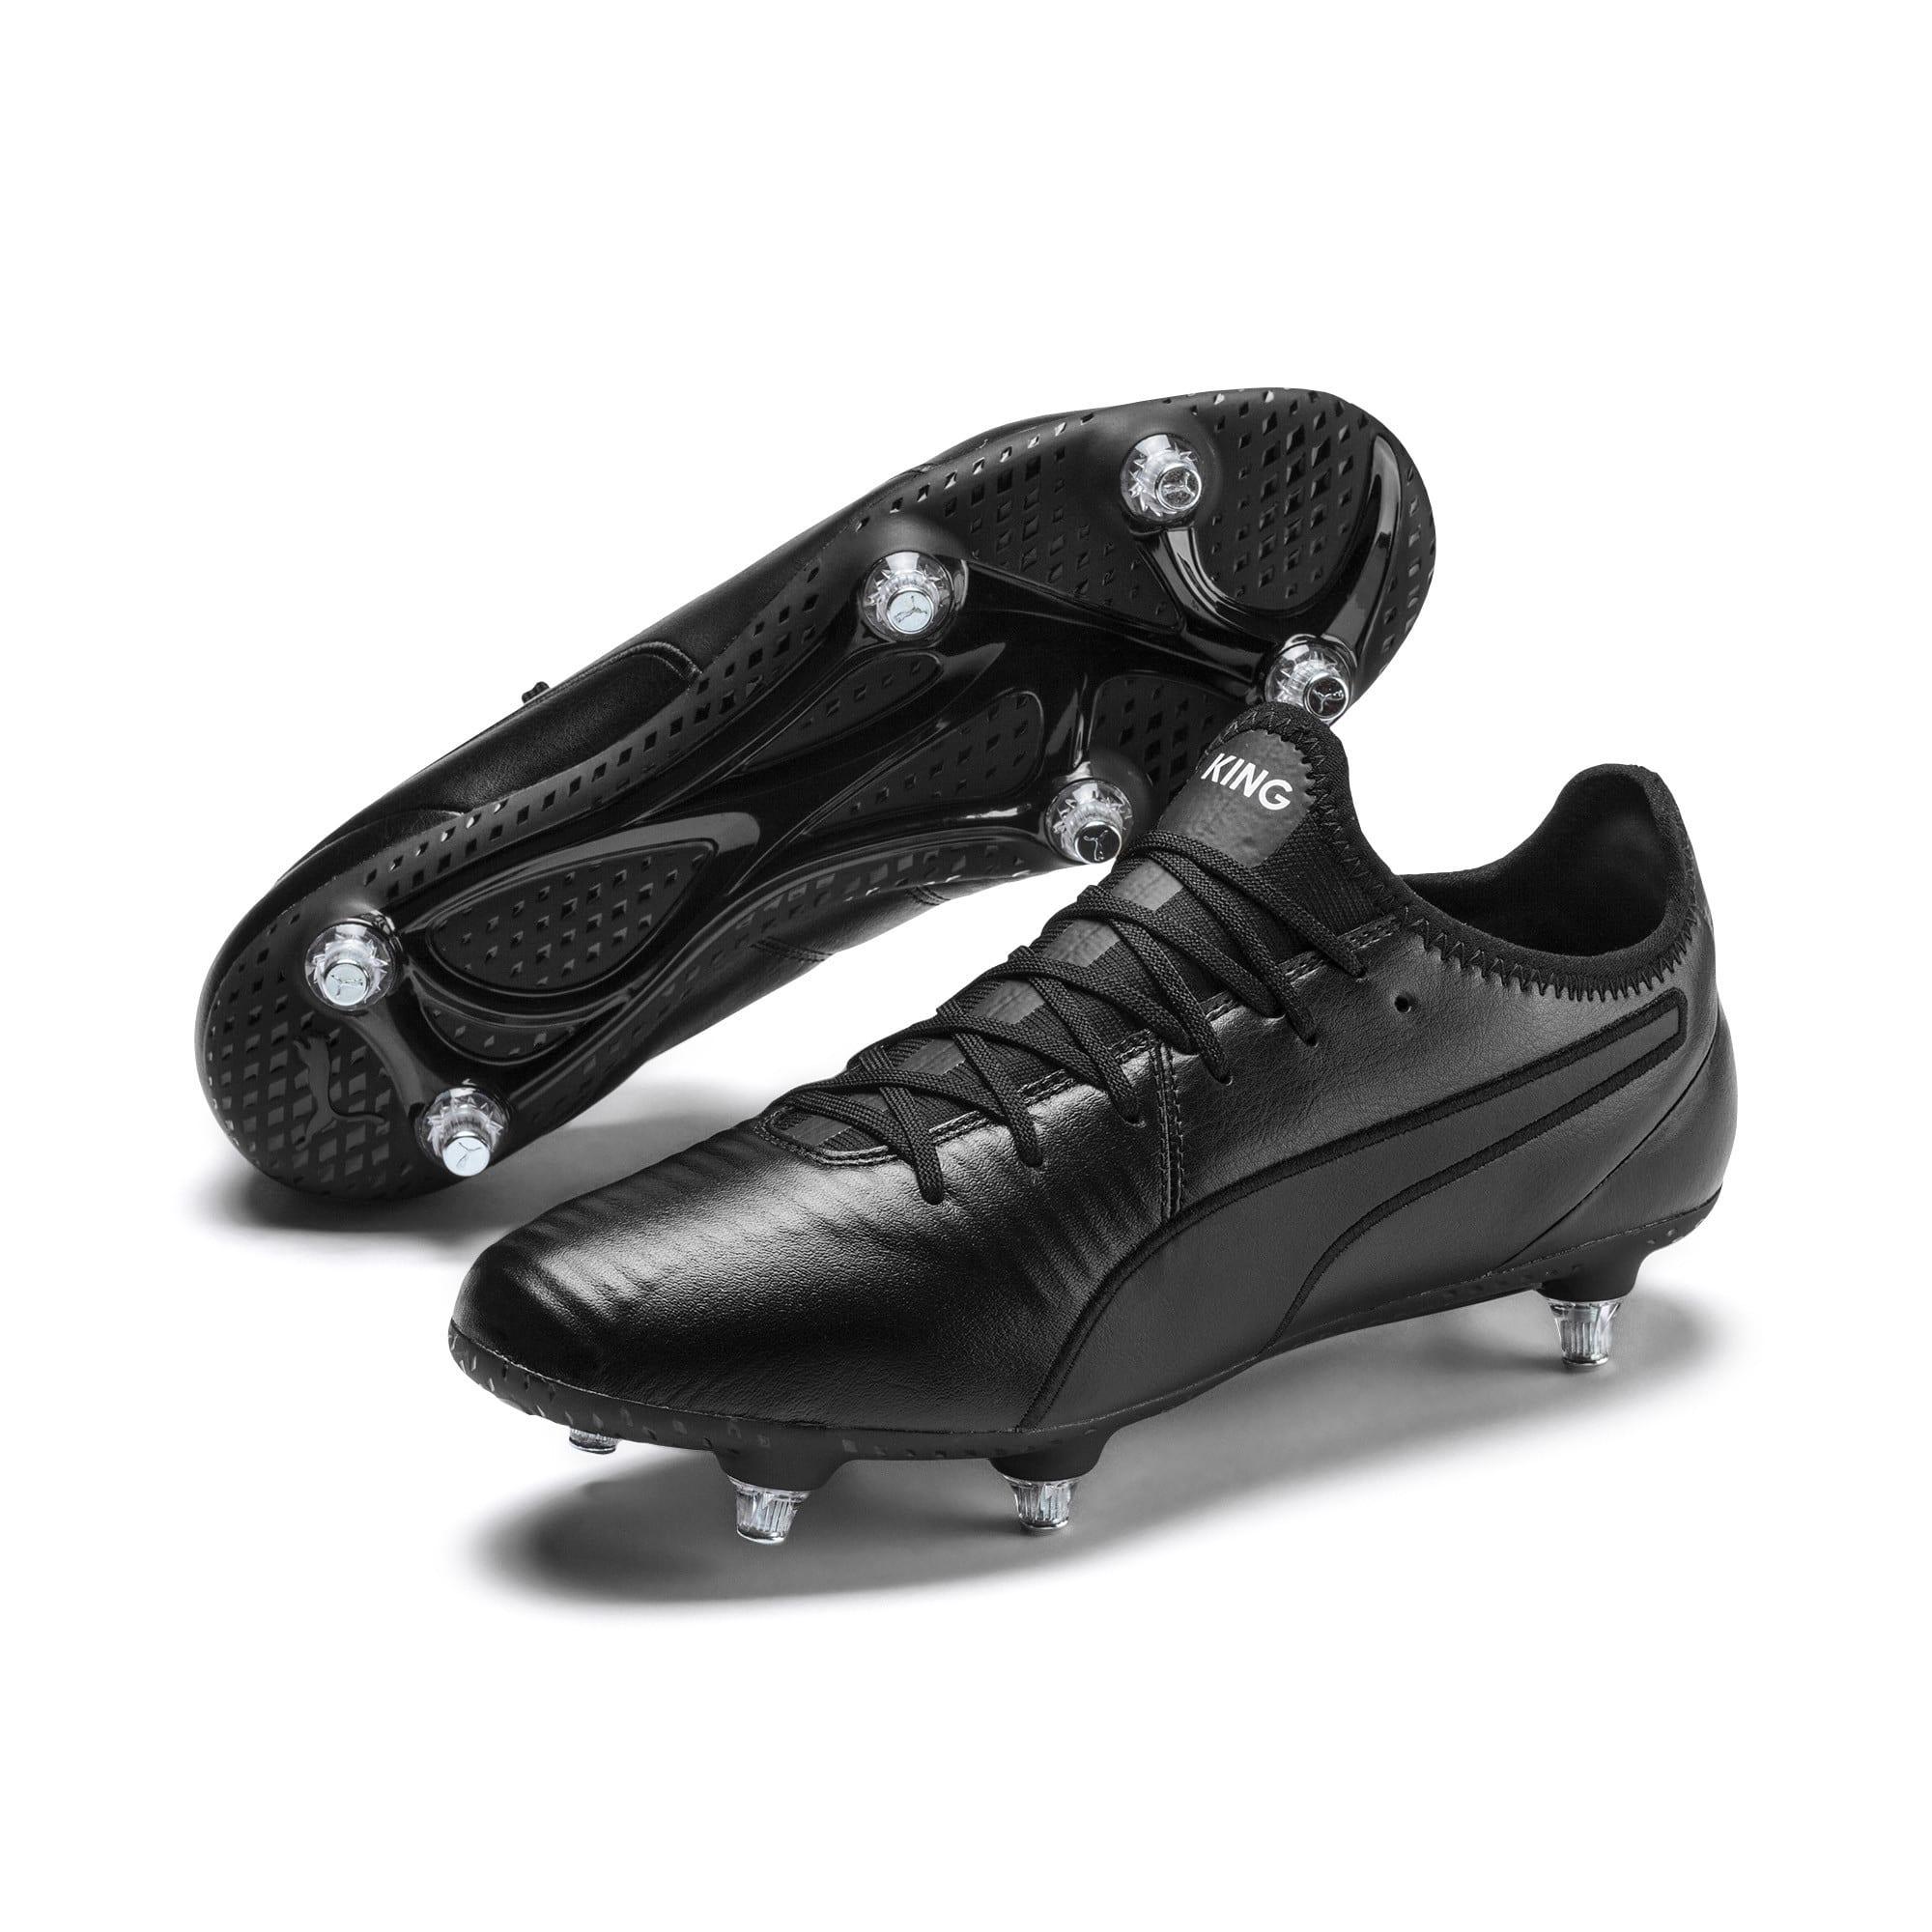 Thumbnail 3 of KING SG Men's Football Boots, Puma Black-Puma White, medium